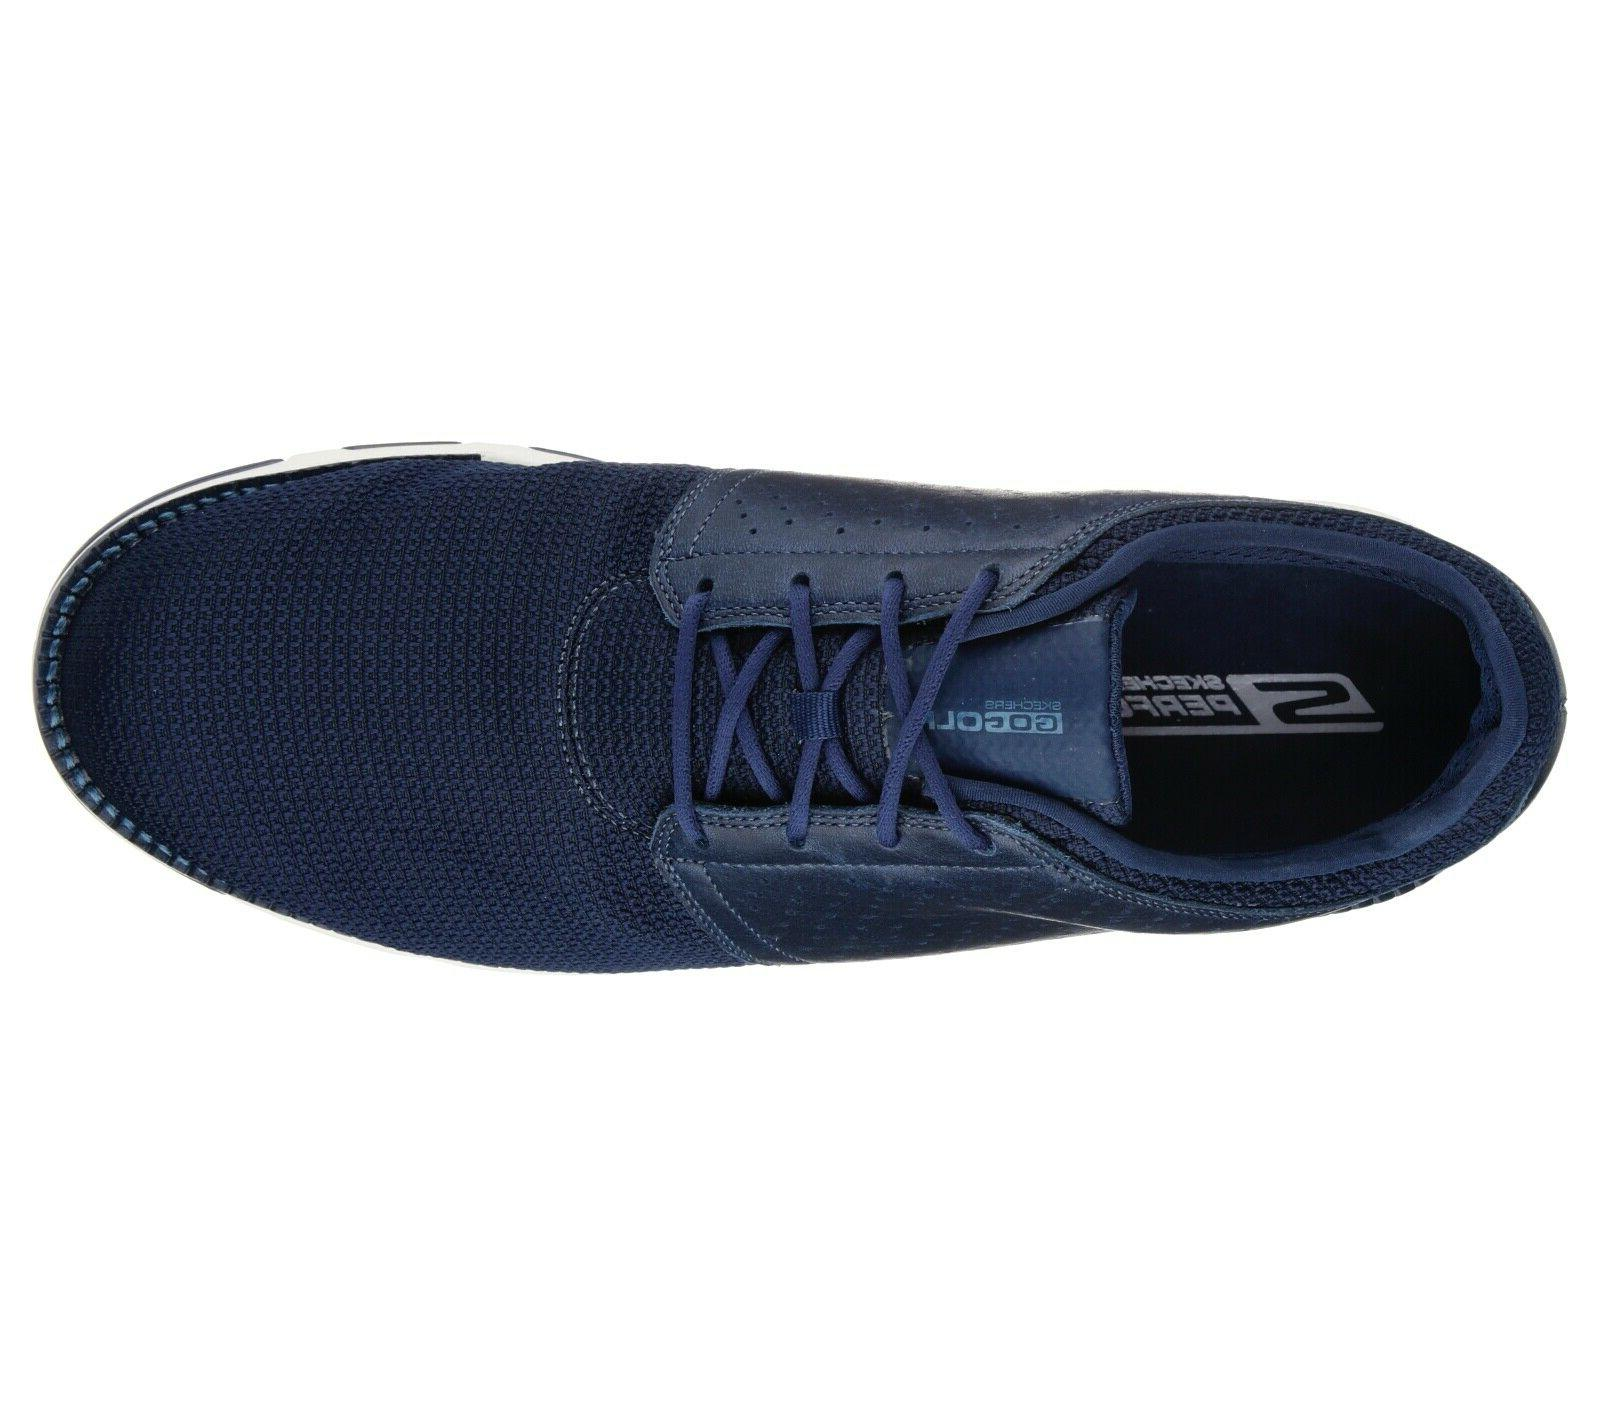 Skechers Golf V.3 Shoes-Style 54522-NVY